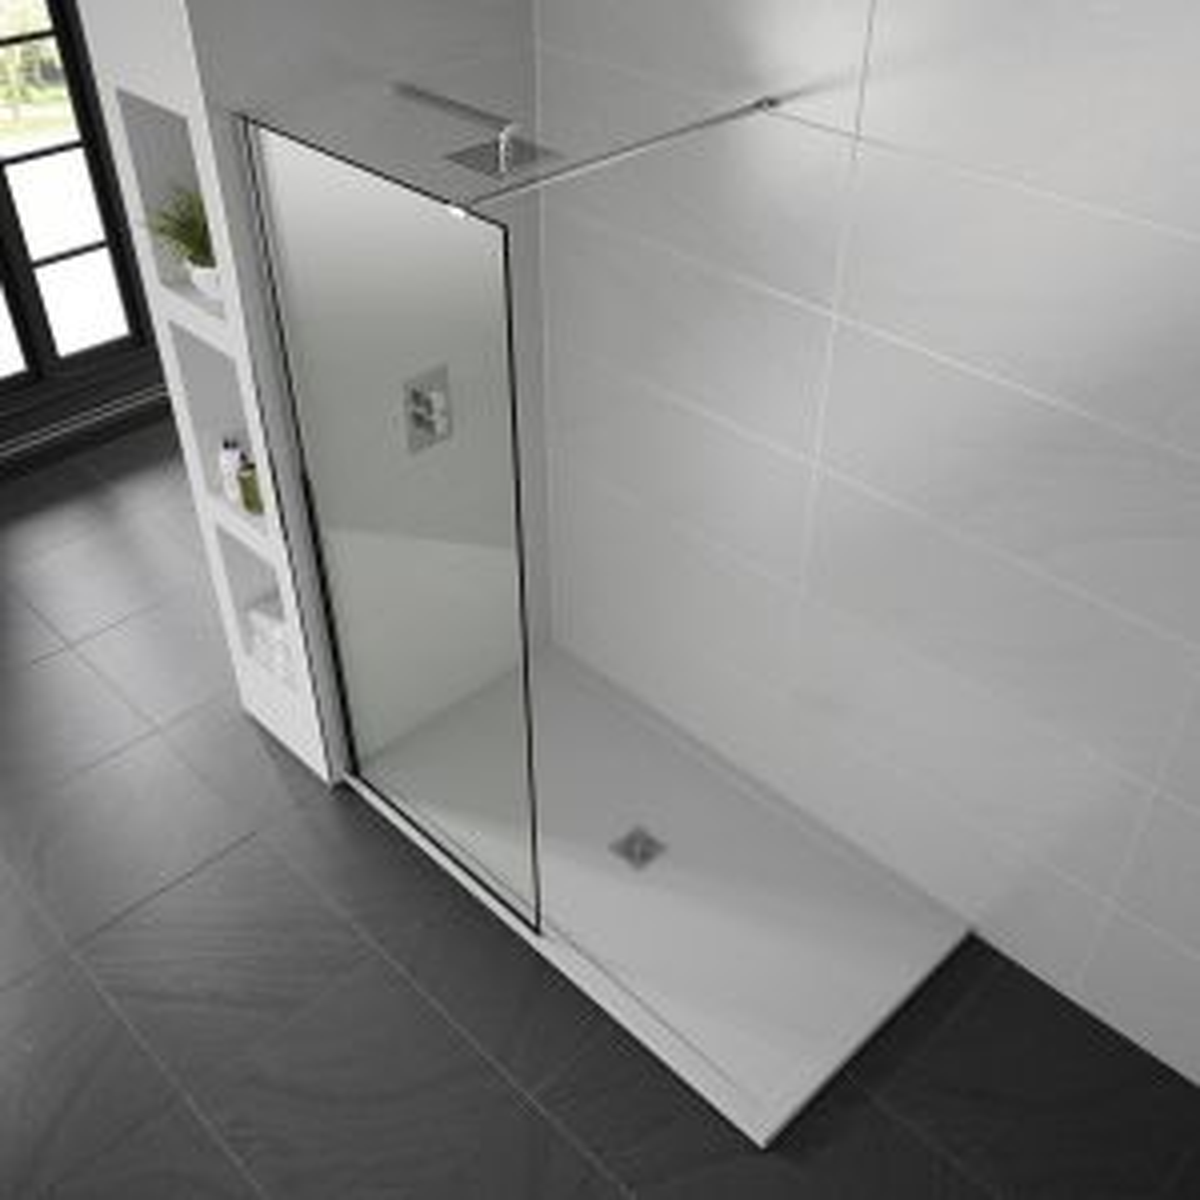 Aquadart Grey Slate Shower Tray 1700 x 900 Lifestyle